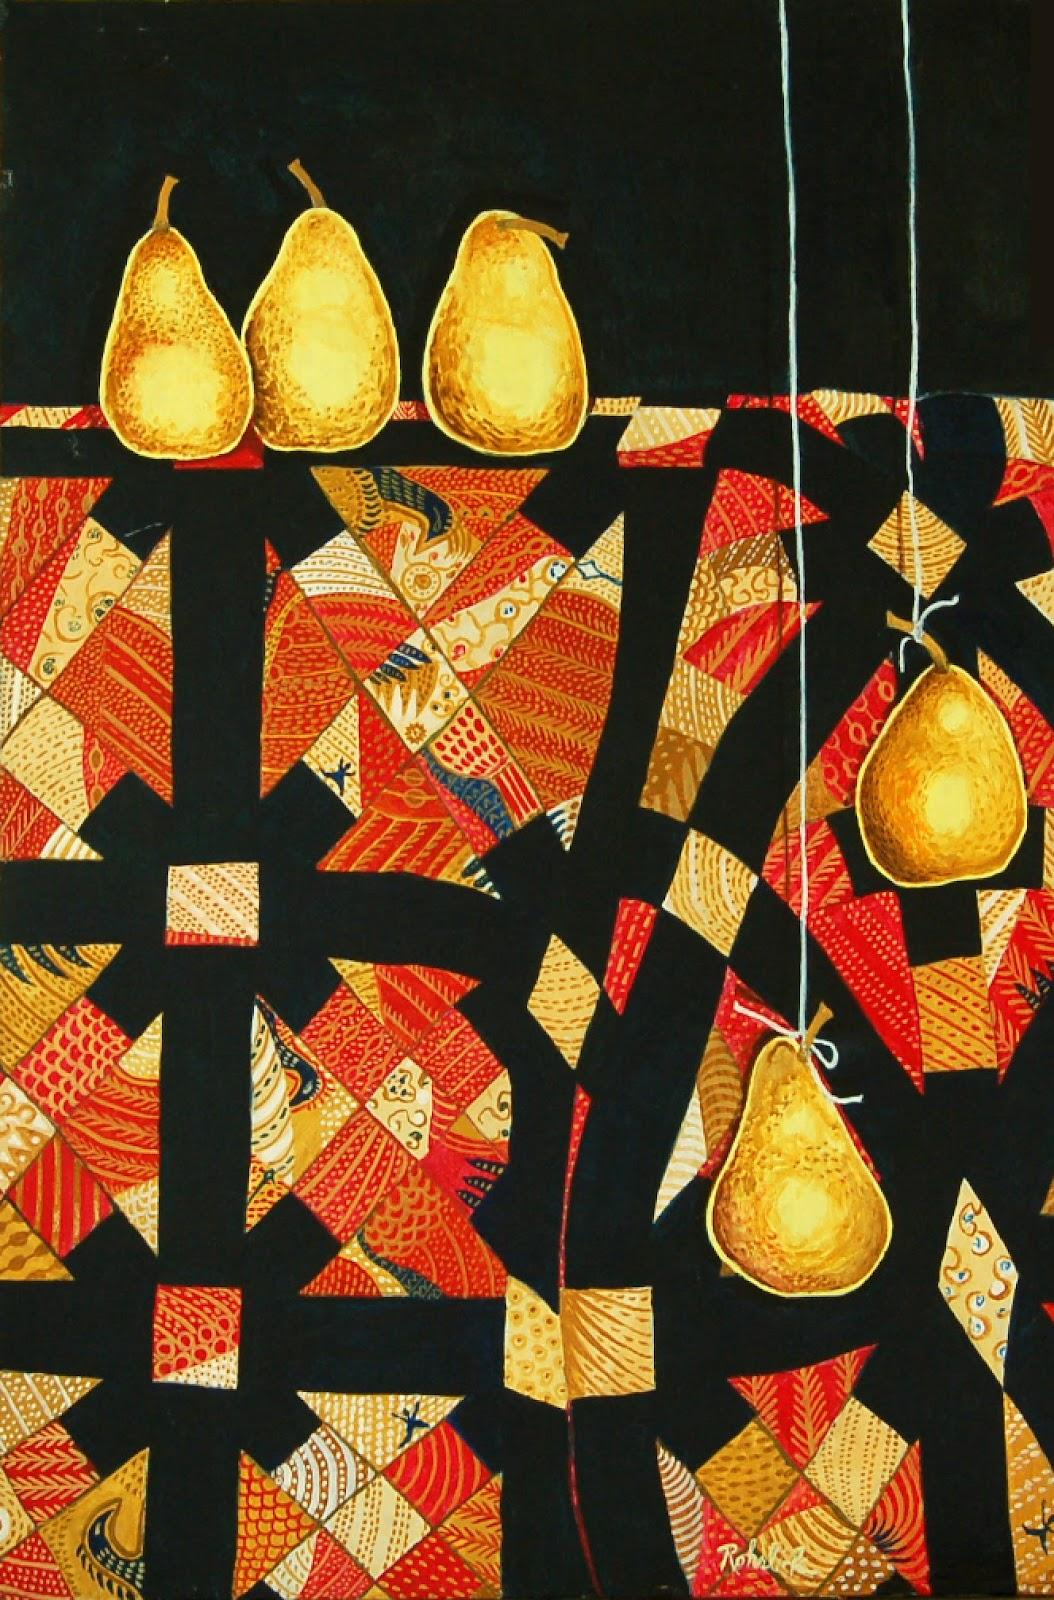 088 -Balinese Quilt #1-, 24- x 36-,  acrylics on canvas (2).jpg